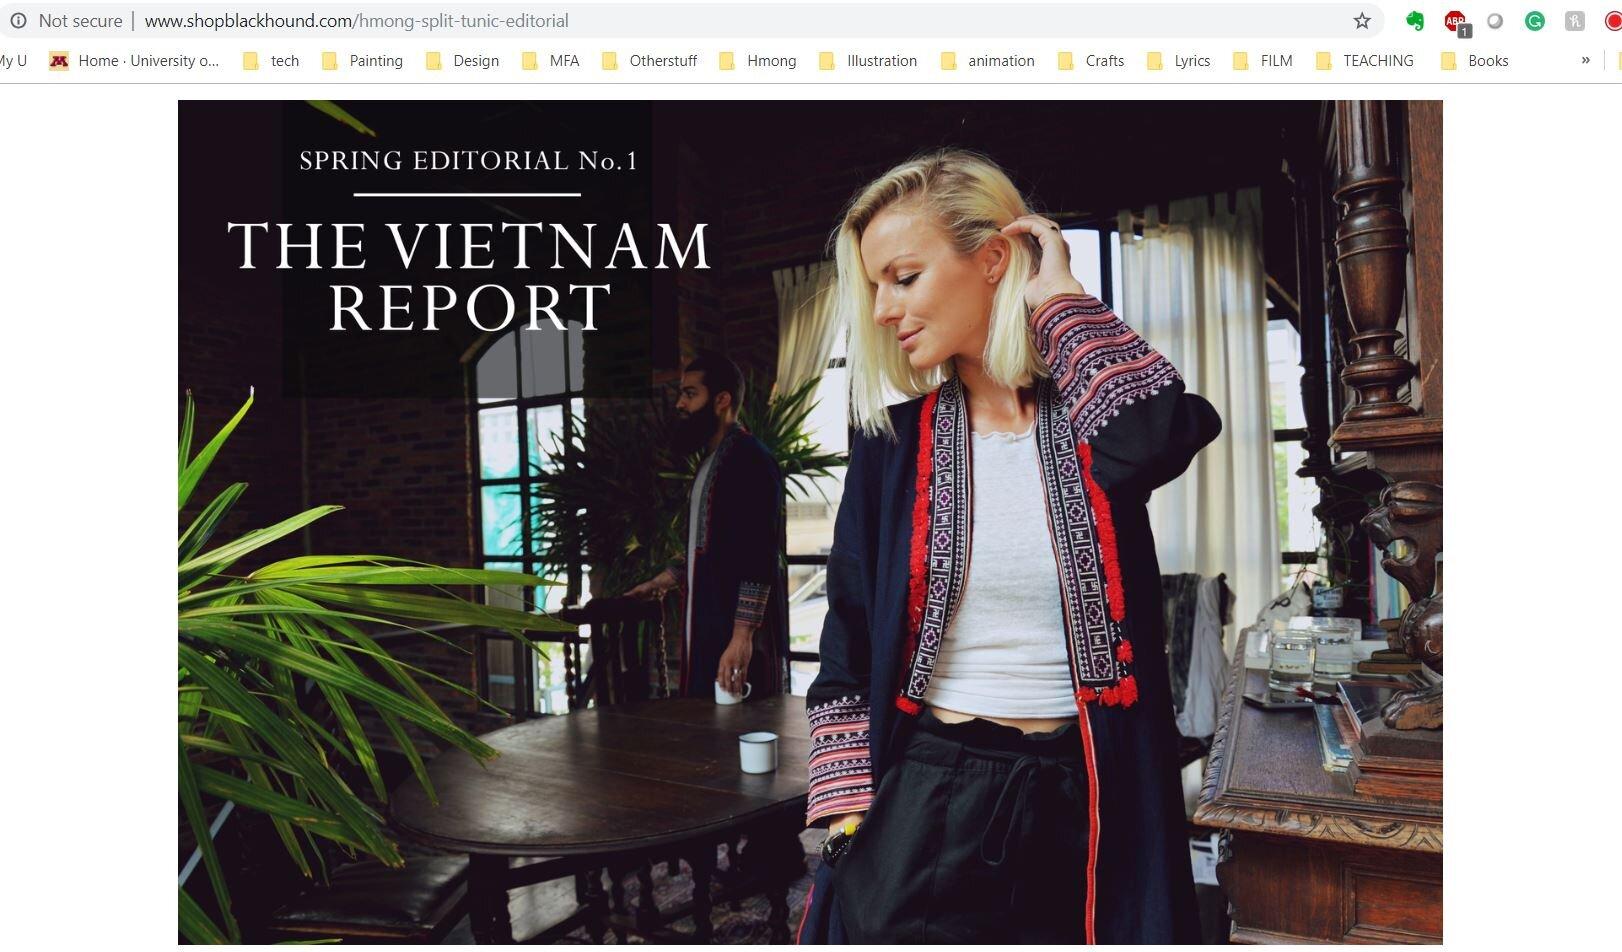 Shopblackhound_hmong Shirt_4.JPG